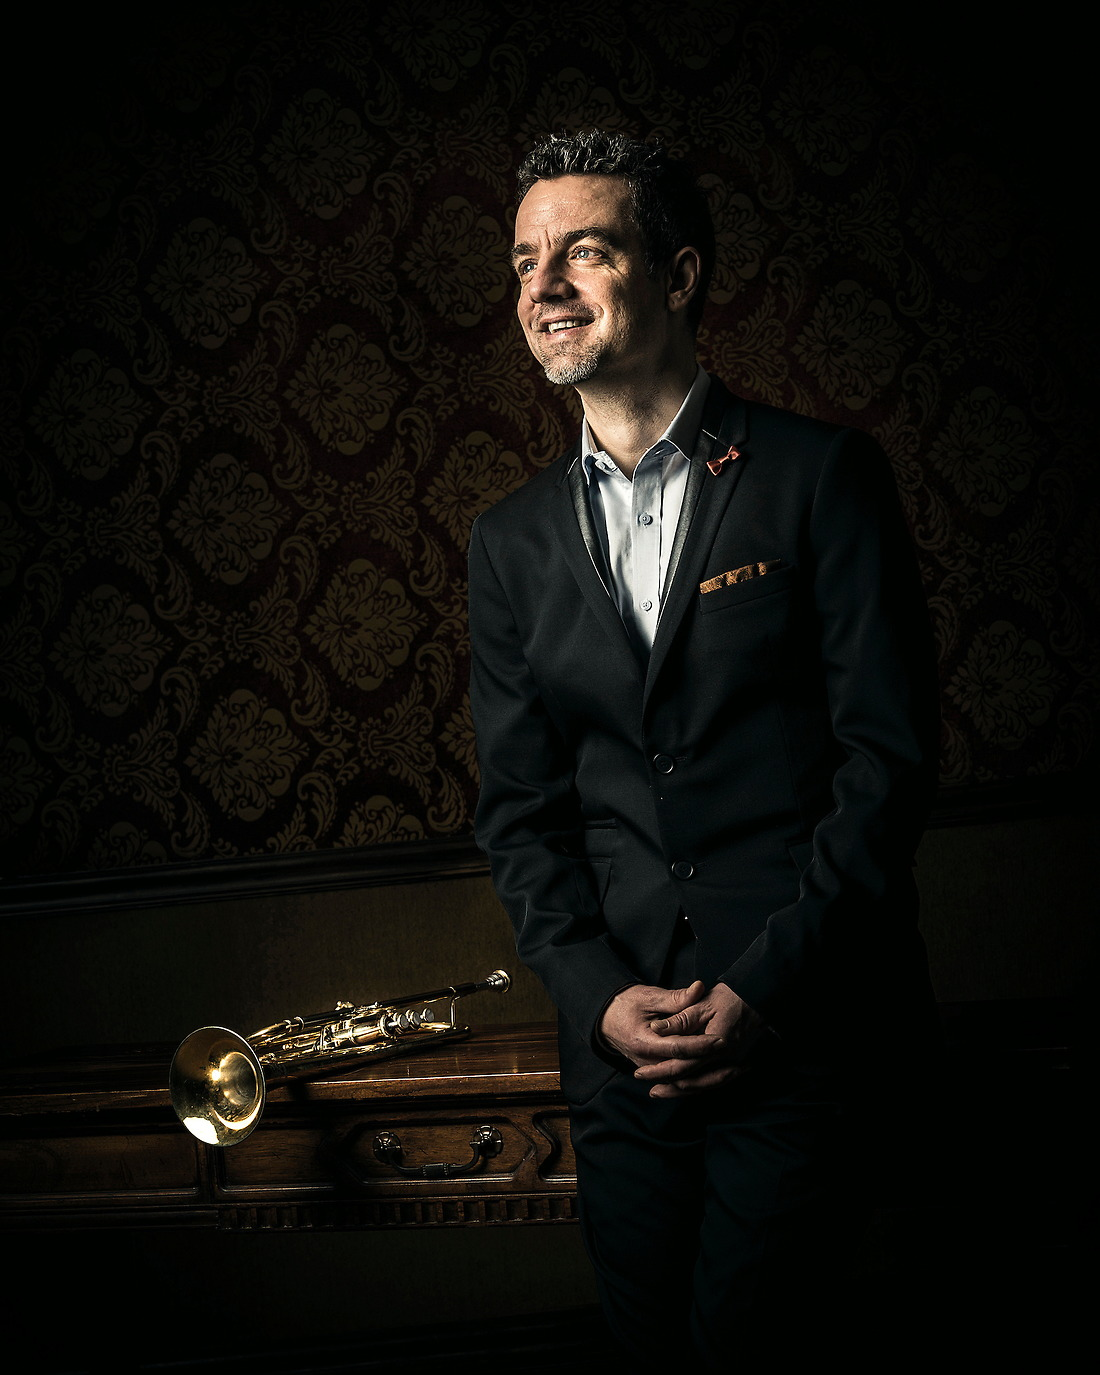 Joe Burgstaller International Trumpet Soloist / Clinician and former member of Canadian Brass. — © Jeremy Lock/